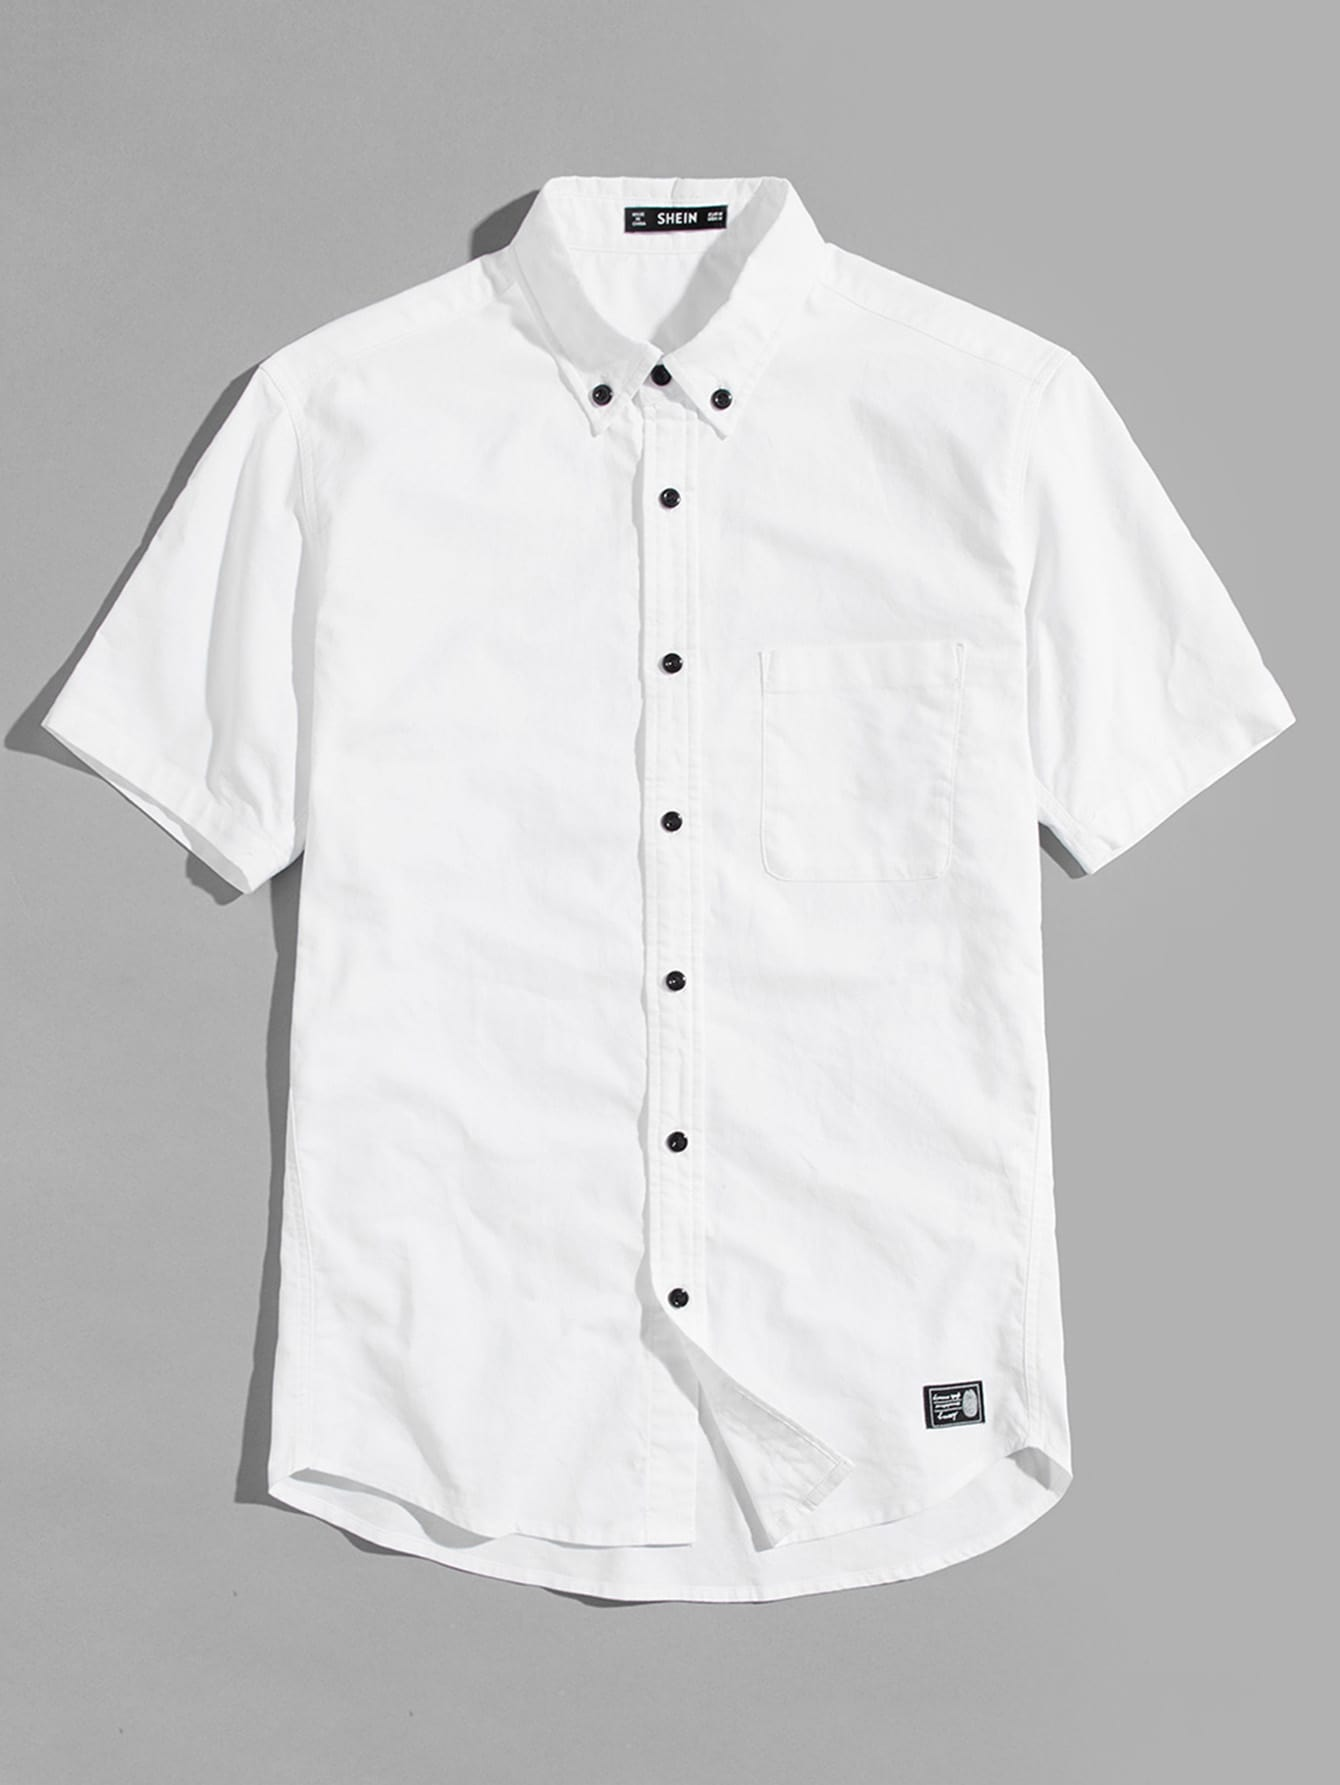 Купить Мужская карманная рубашка, null, SheIn